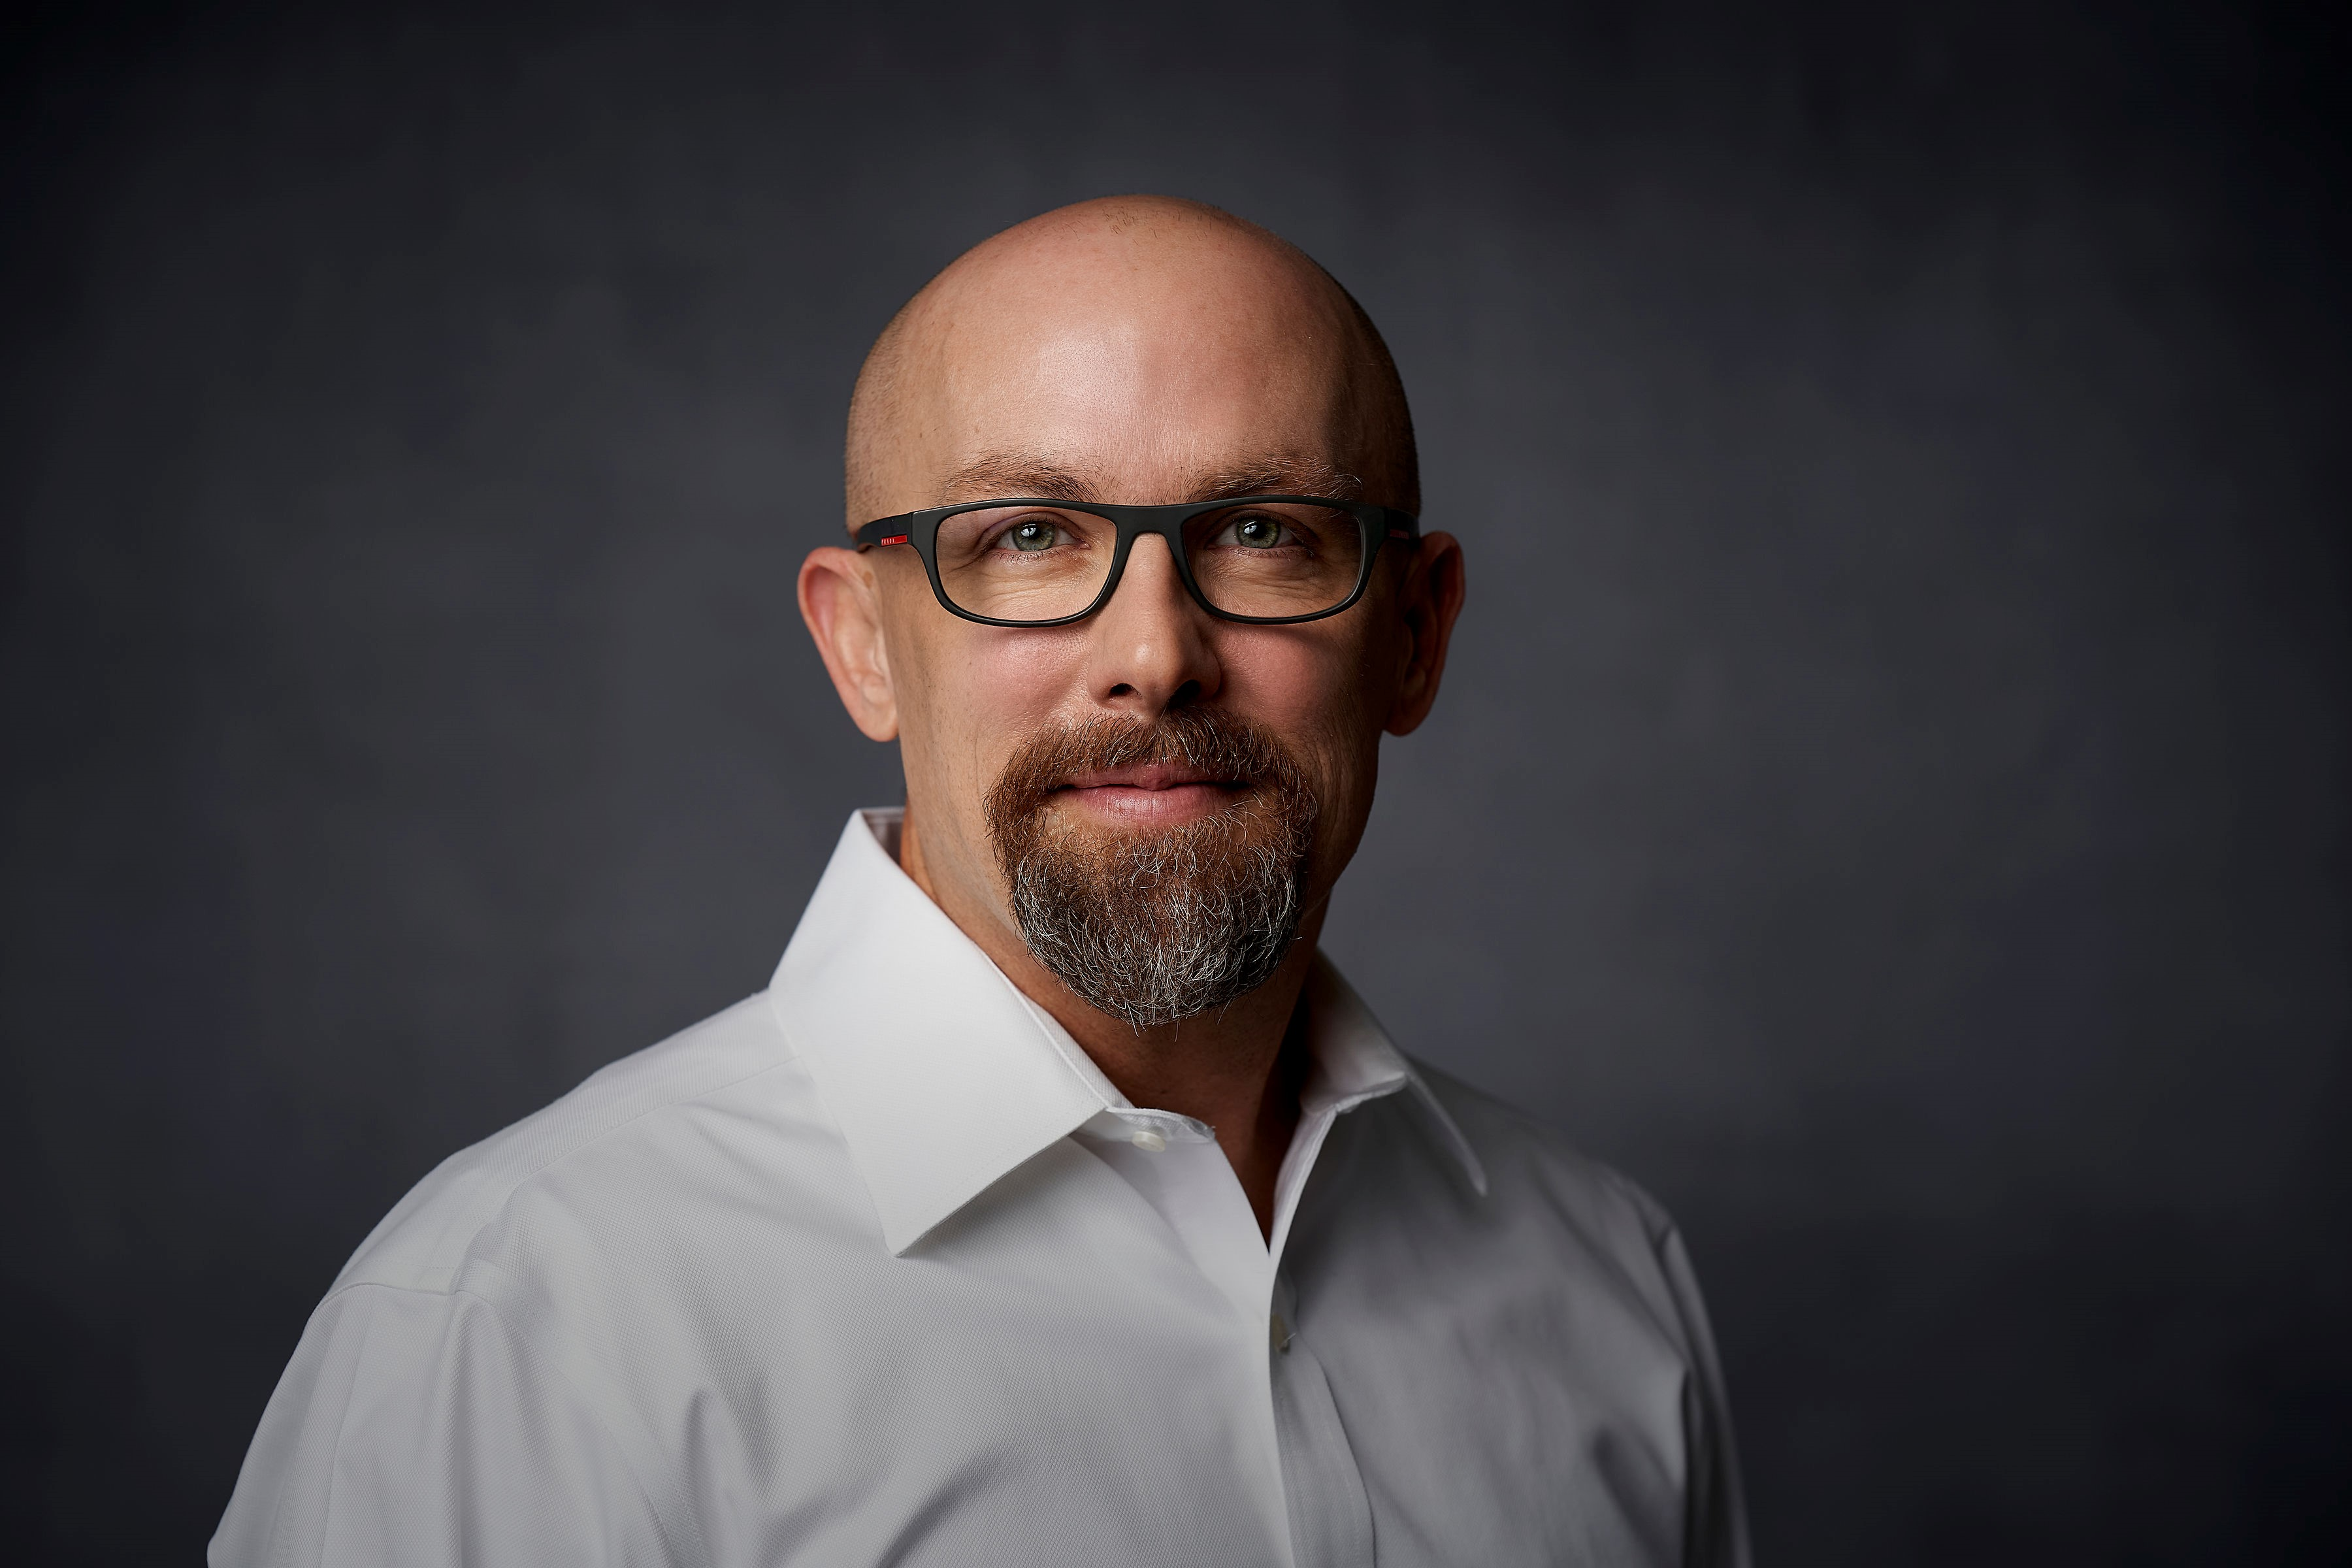 Executive Coach Paul Tripp